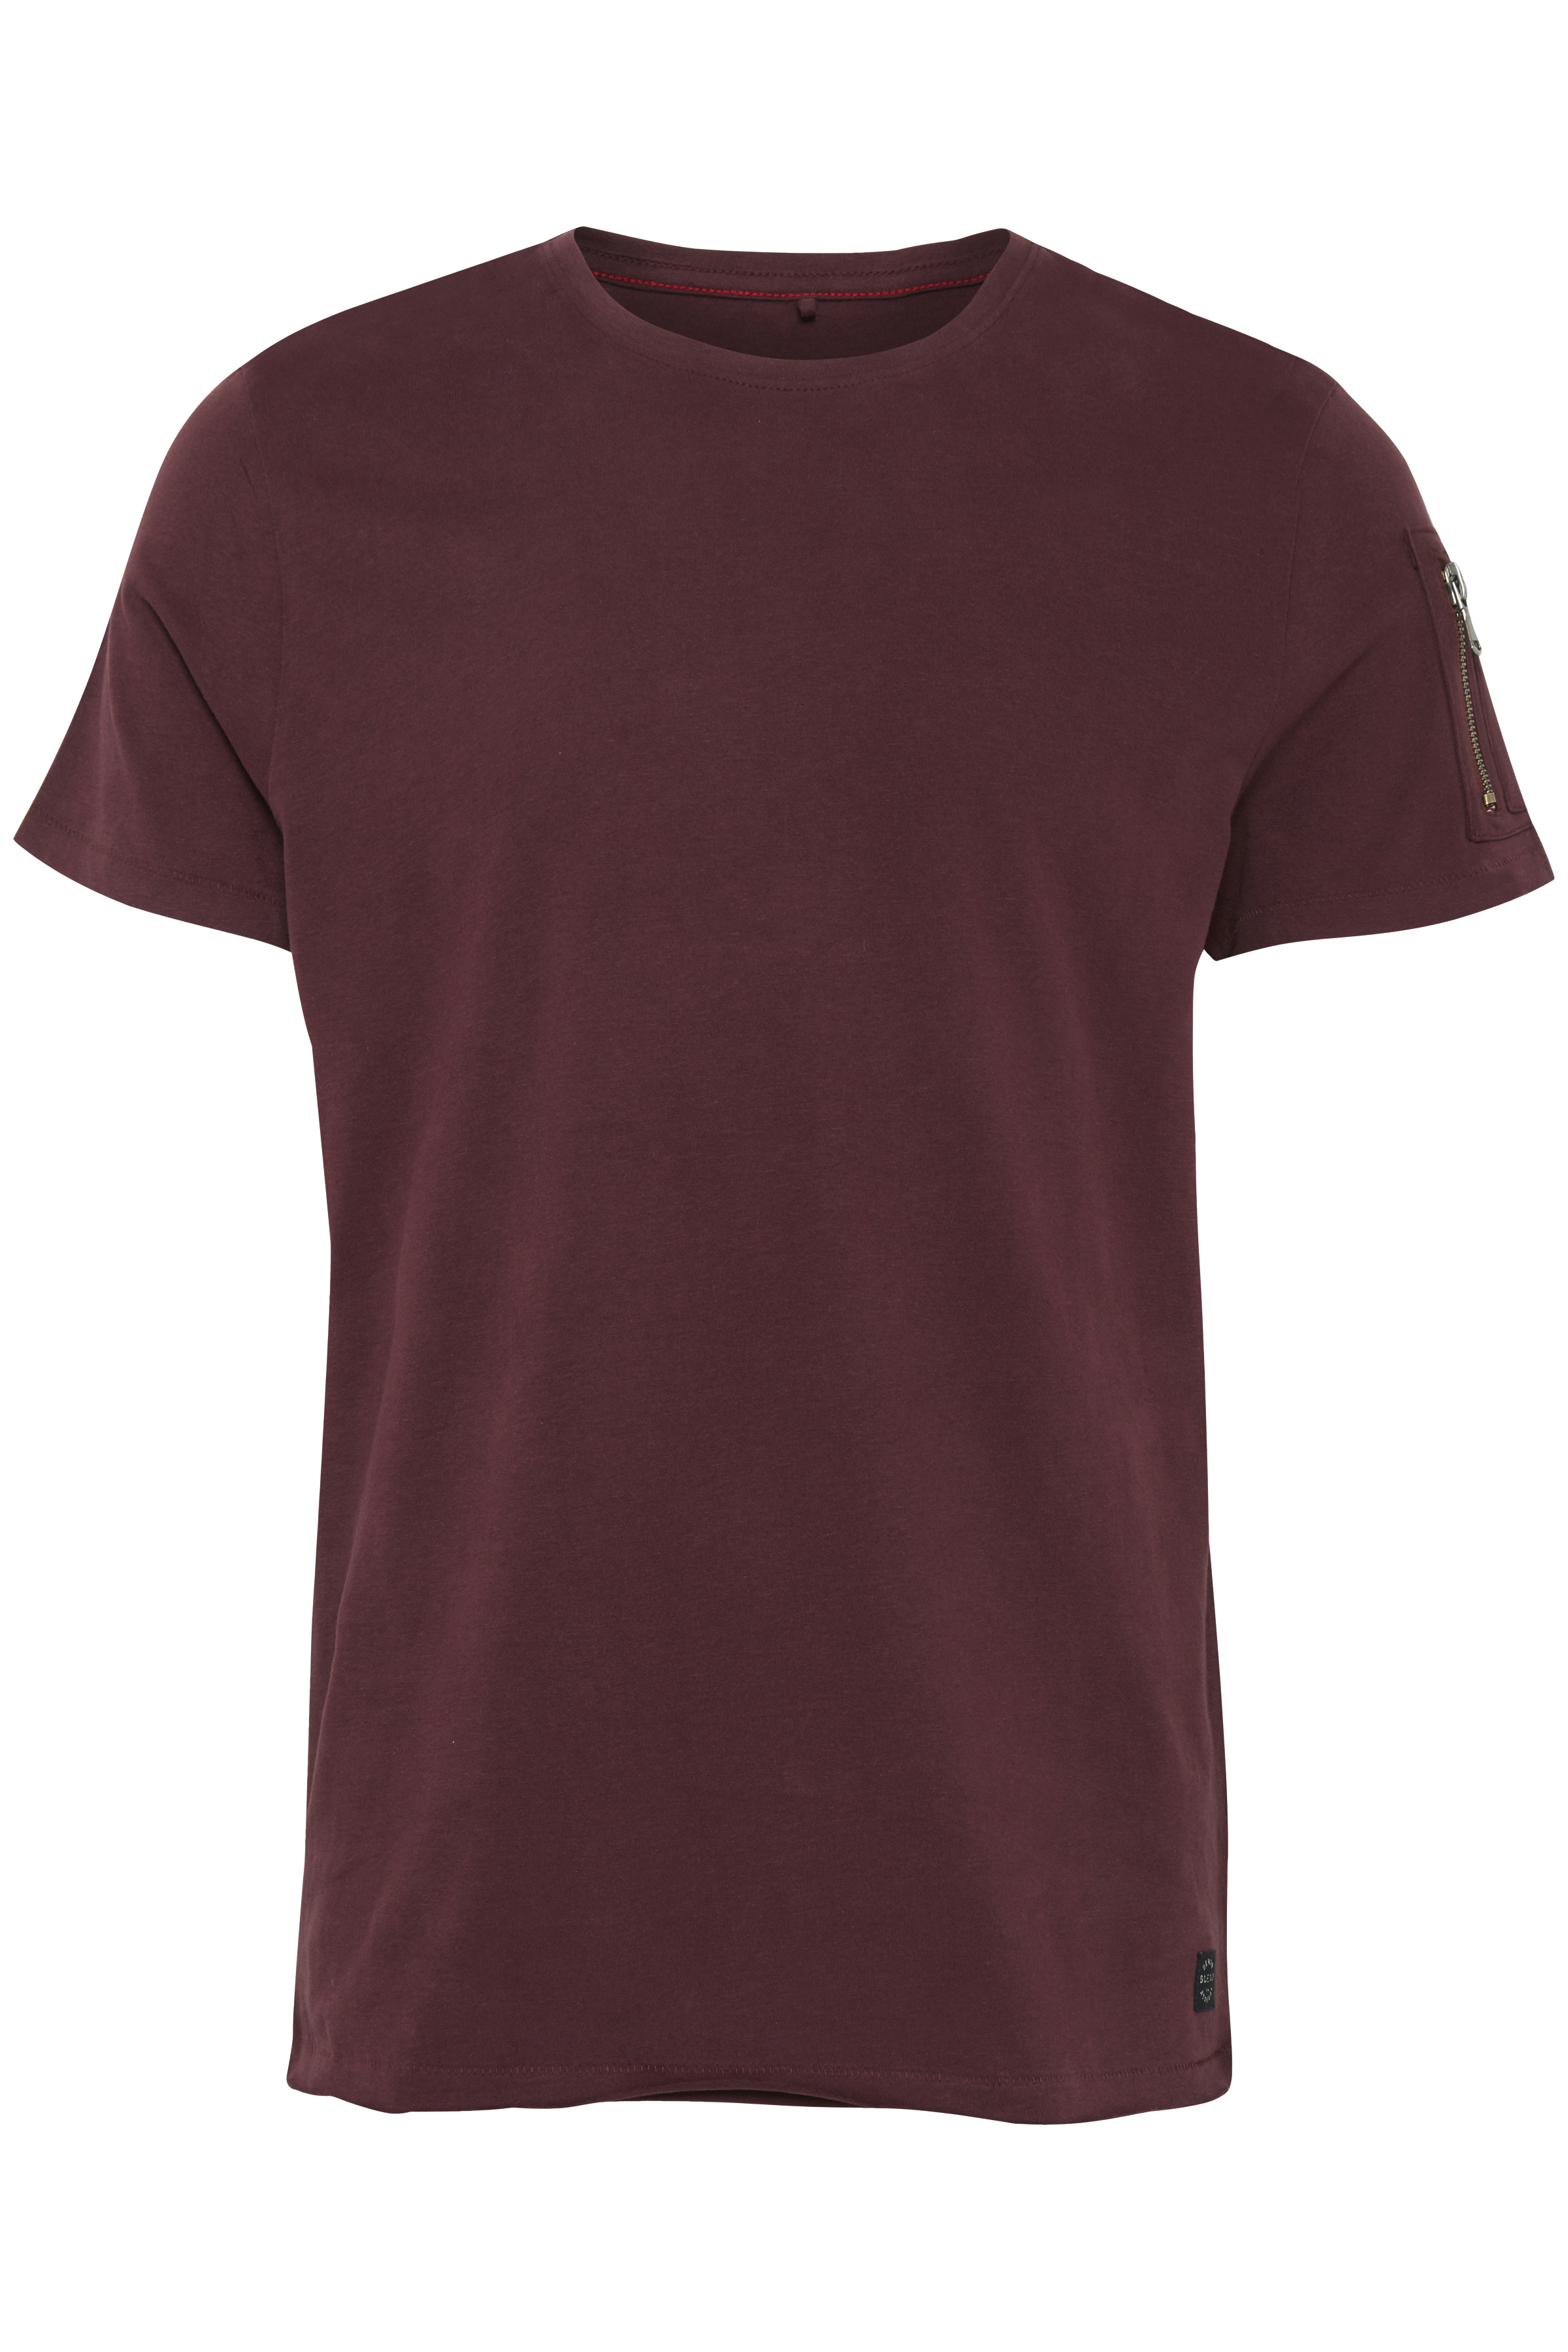 Bordeaux Kortärmad T-shirt från Blend He – Köp Bordeaux Kortärmad T-shirt från stl. S-3XL här